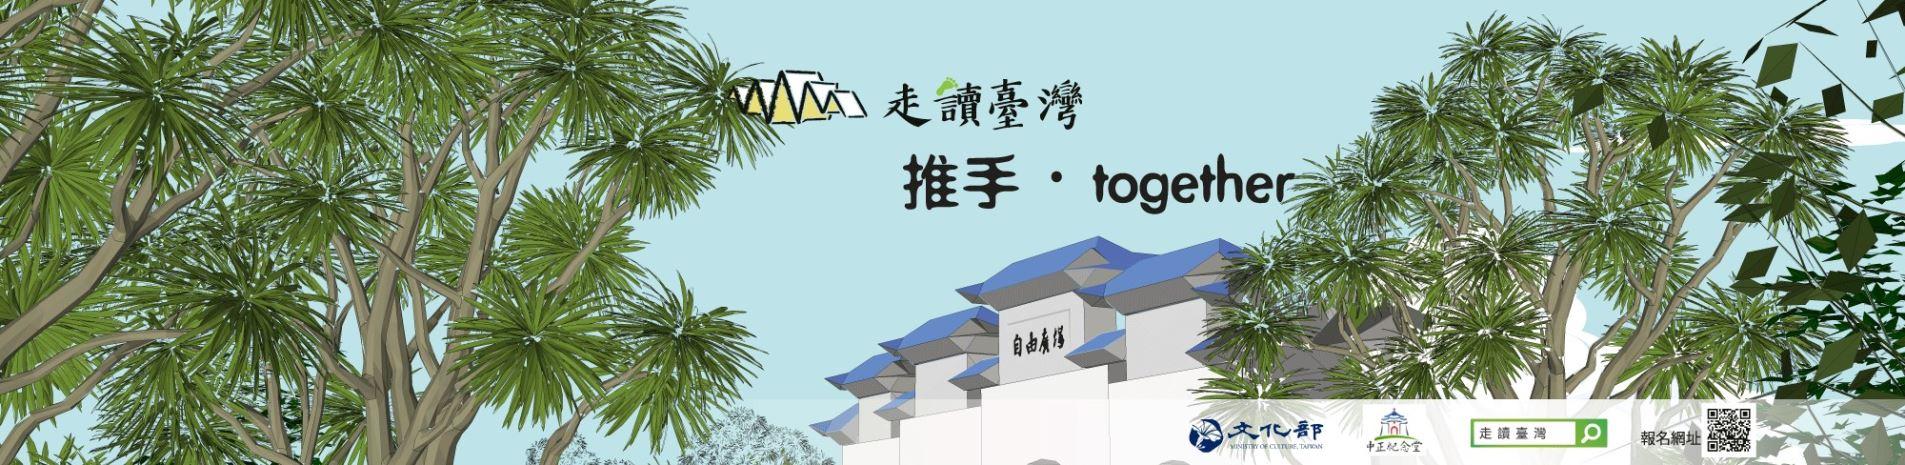 走讀台灣-推手・Together(免費參加)